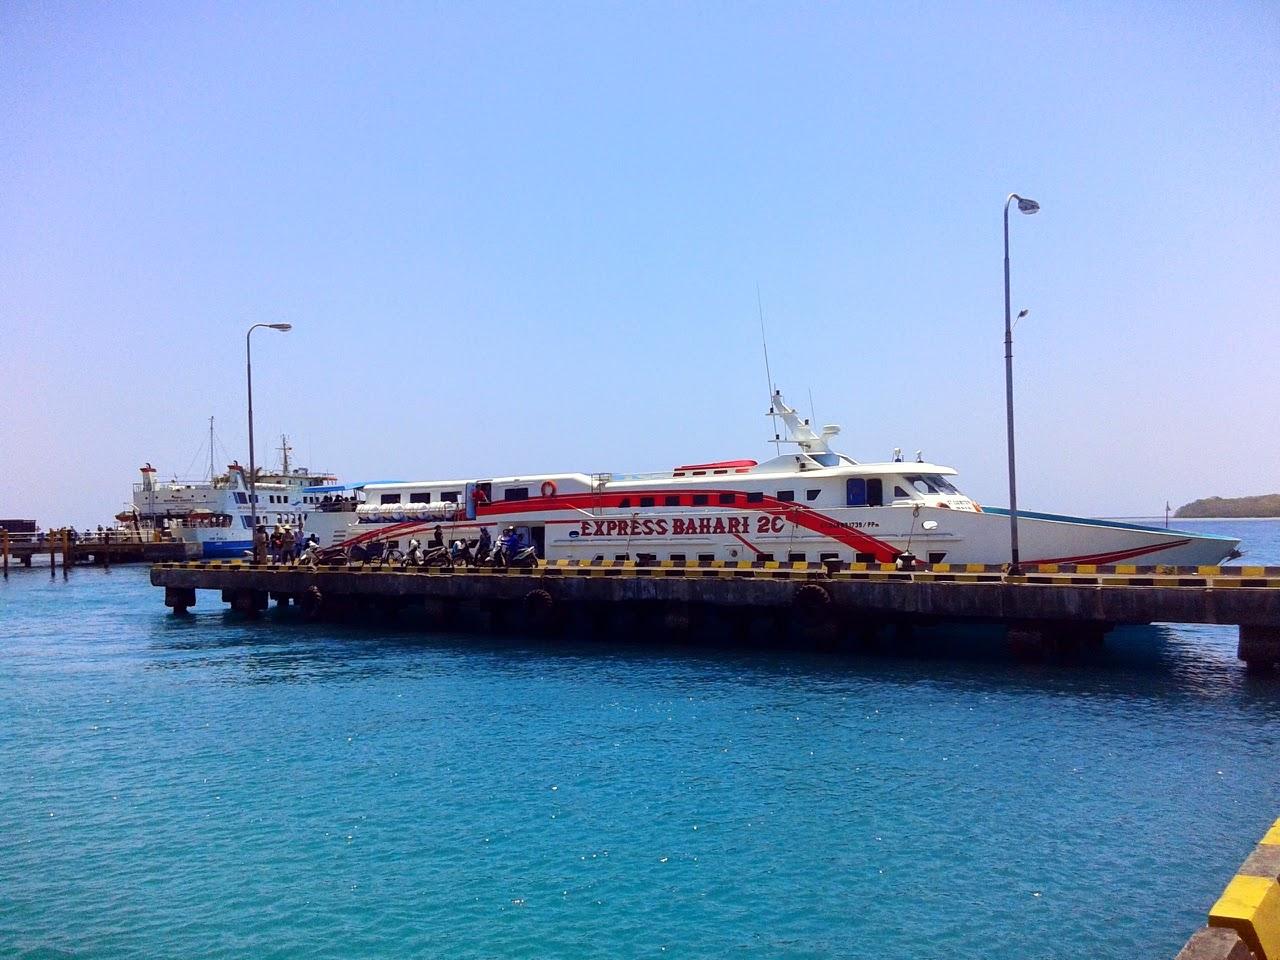 Kapal Express Bahari Jepara Karimunjawa Murah